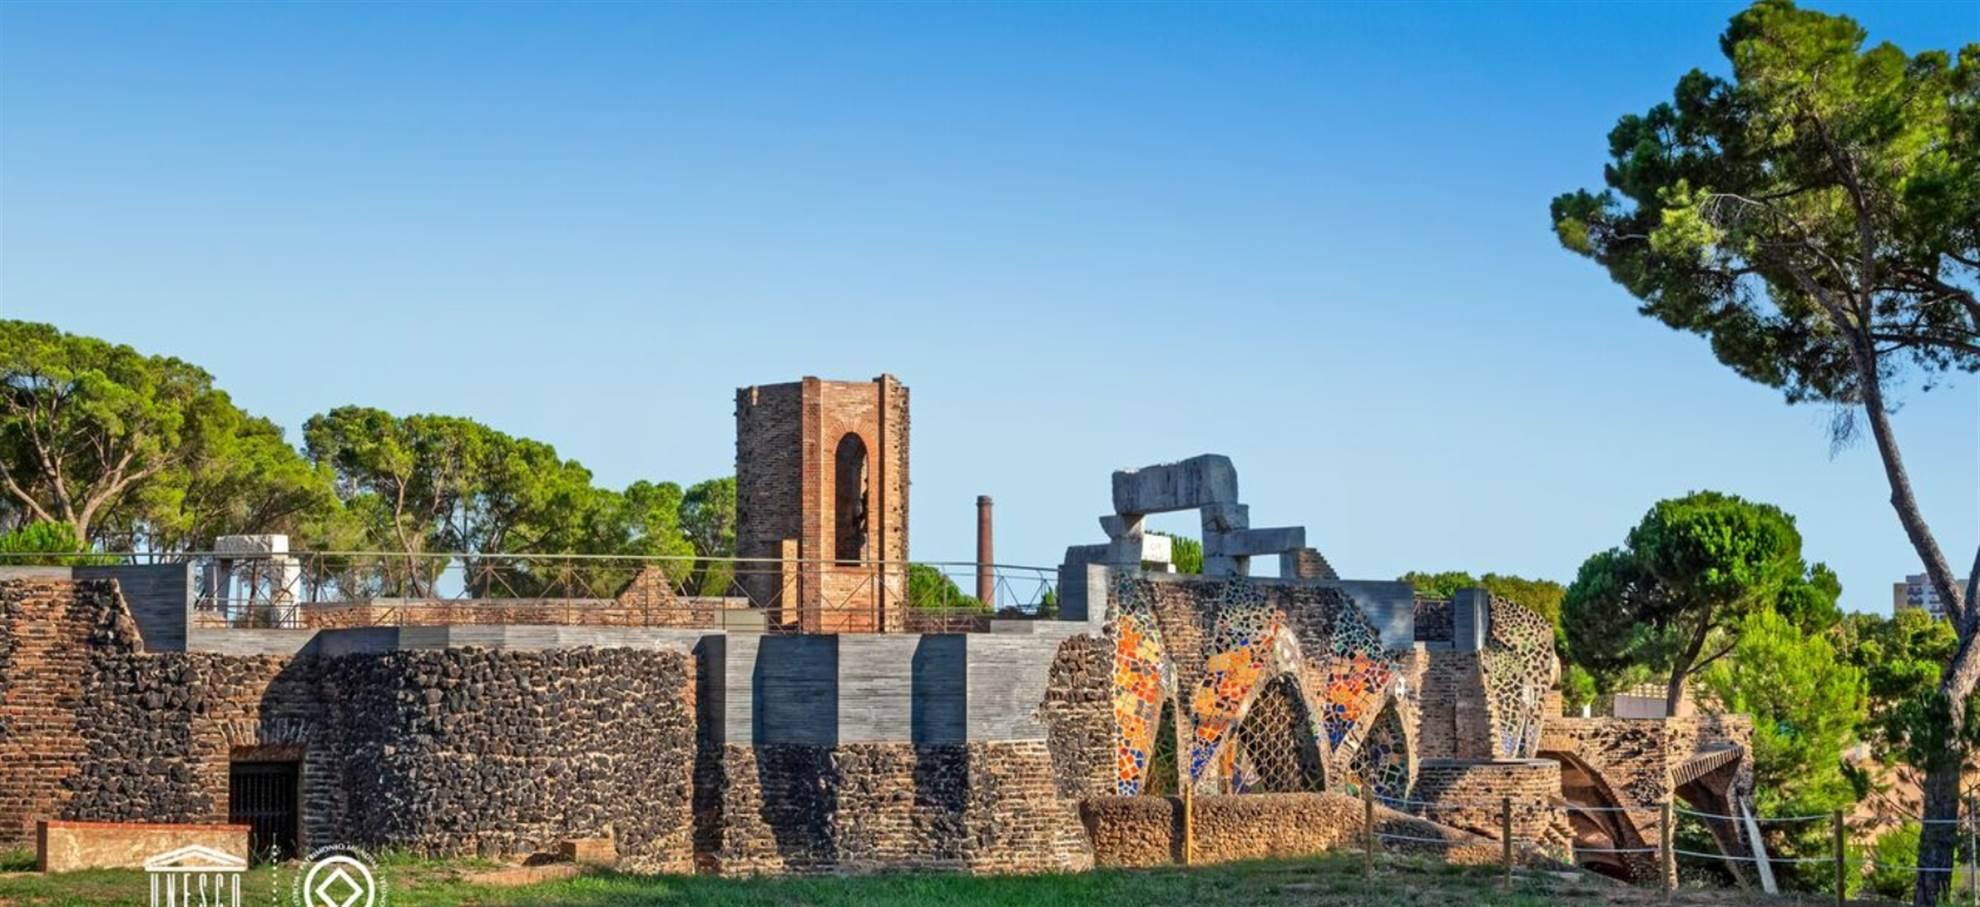 Cripta de Gaudi em Colonia Güell: visita + audioguia